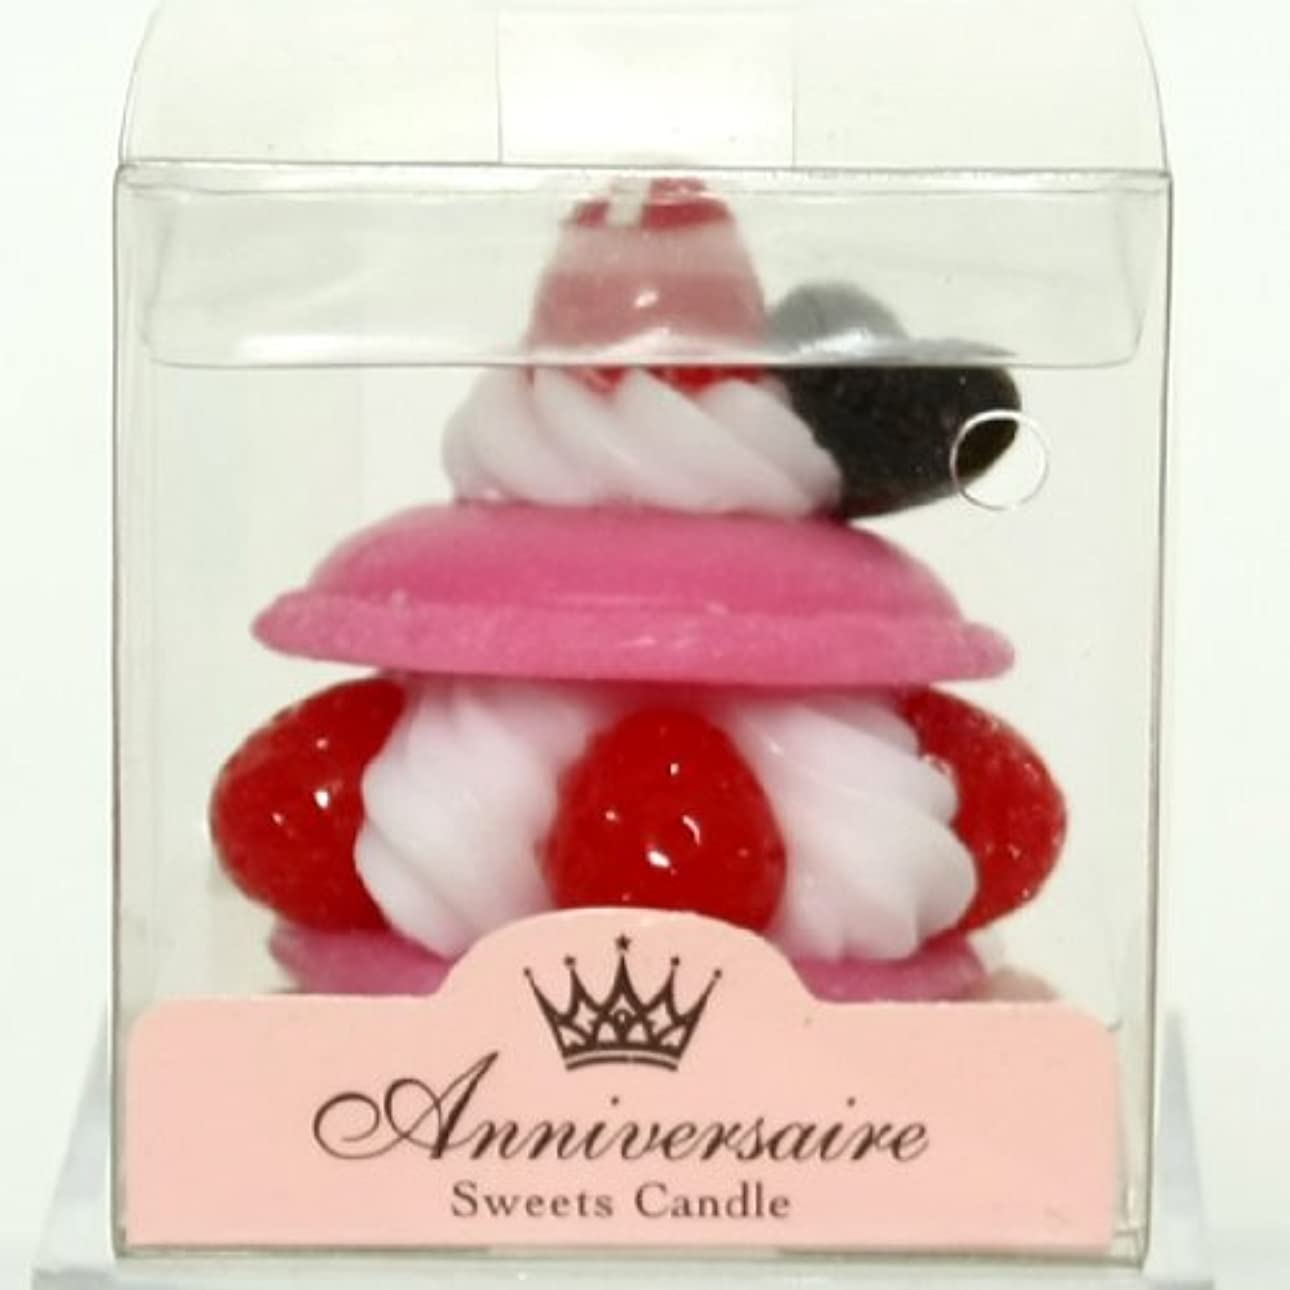 sweets candle(スイーツキャンドル) マカロンケーキキャンドル【ピンク】(ba6580500pk)